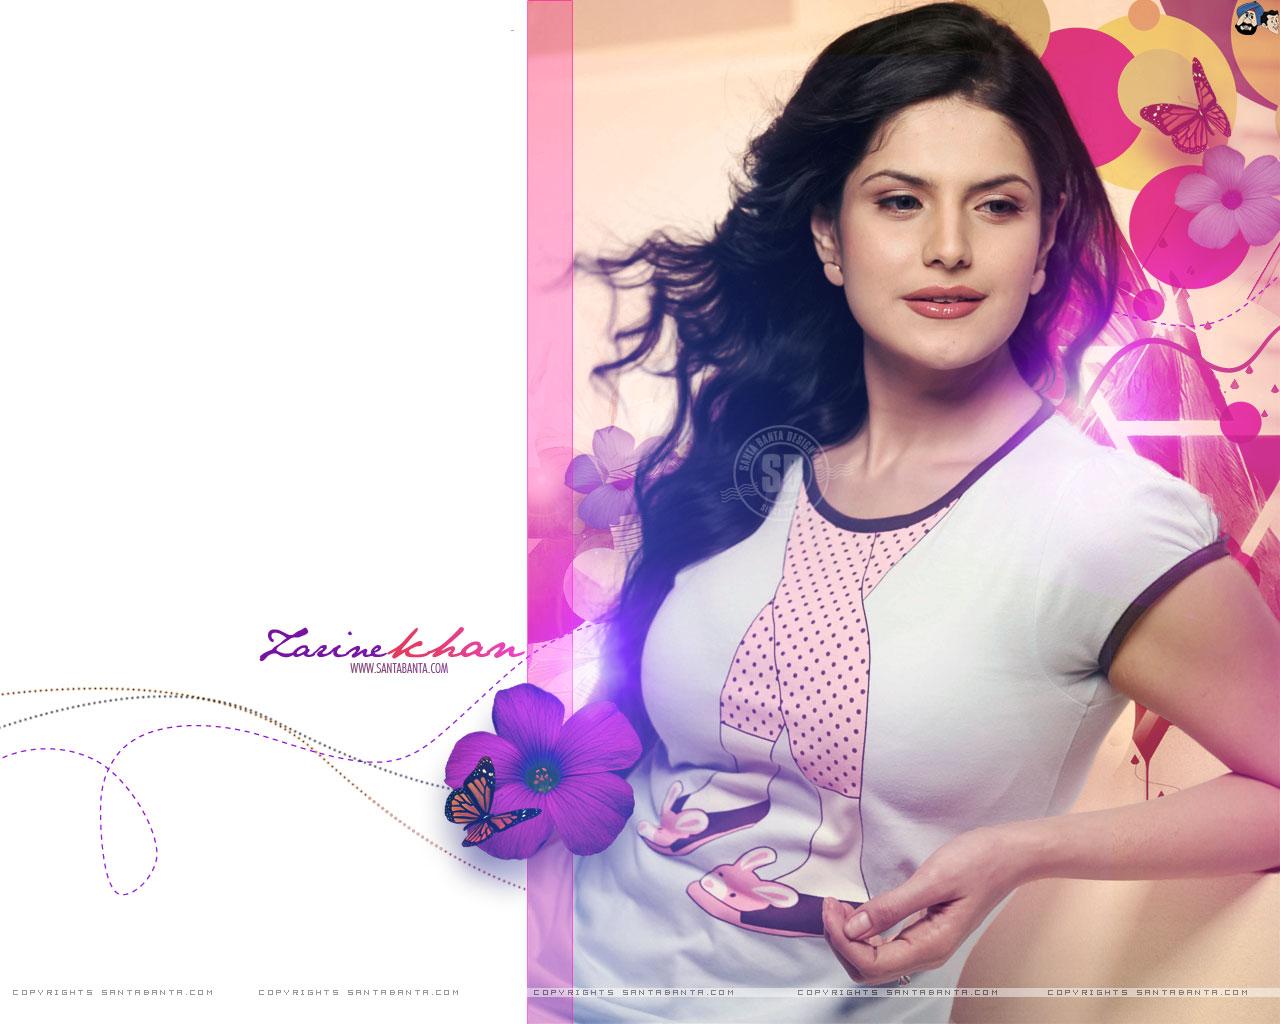 http://3.bp.blogspot.com/-JTKtL8uRgRM/TdN3qELbPjI/AAAAAAAAAwI/du7L6ez8ZGc/s1600/Zarine_Khan_Wallpapers.jpg